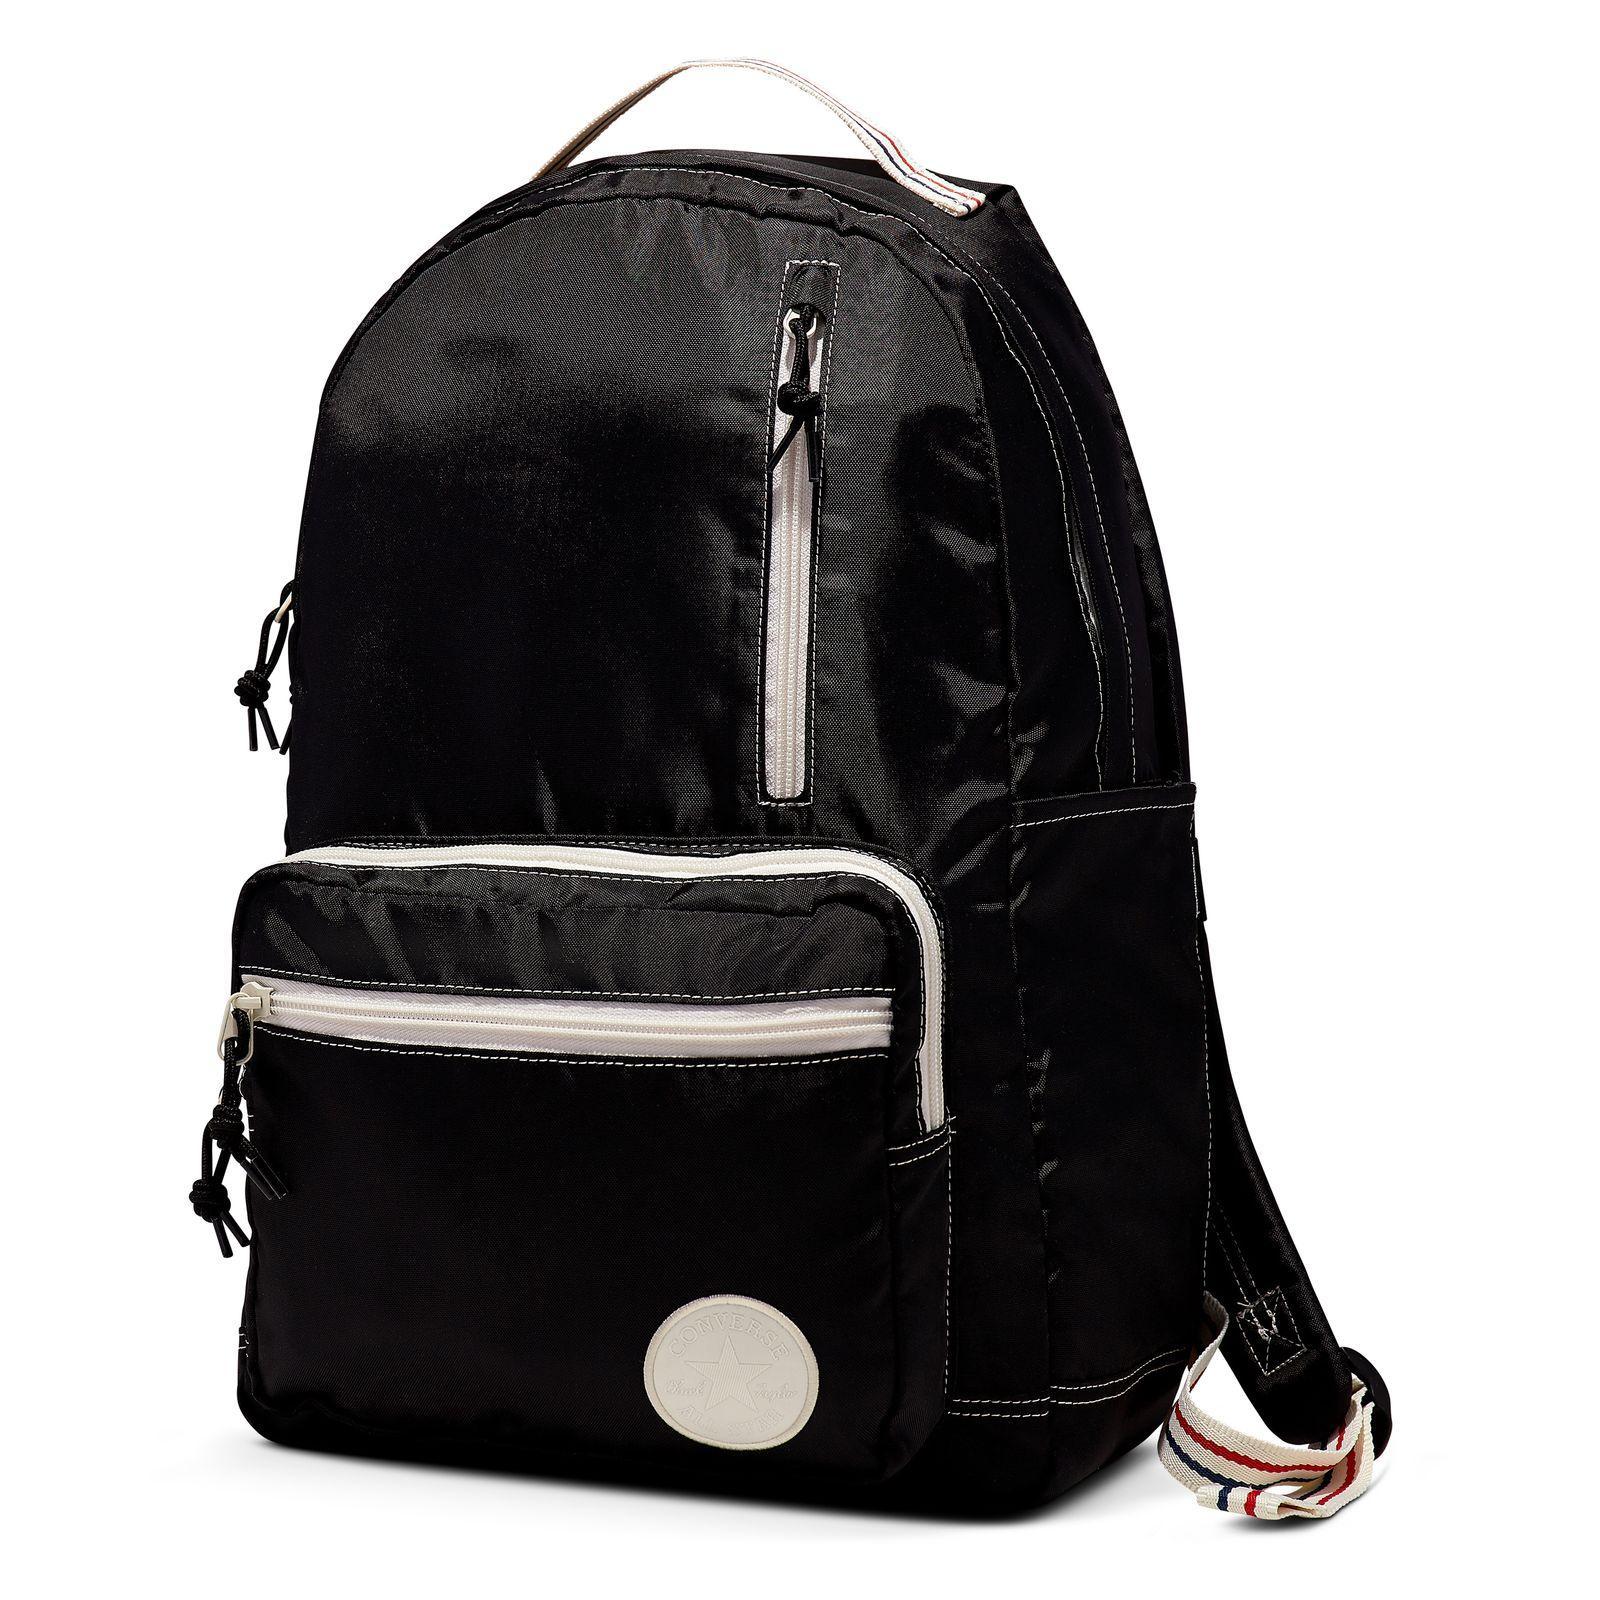 ecce0374f87ce4 Unisex Backpacks for sale - Unisex Travel Backpacks online brands ...